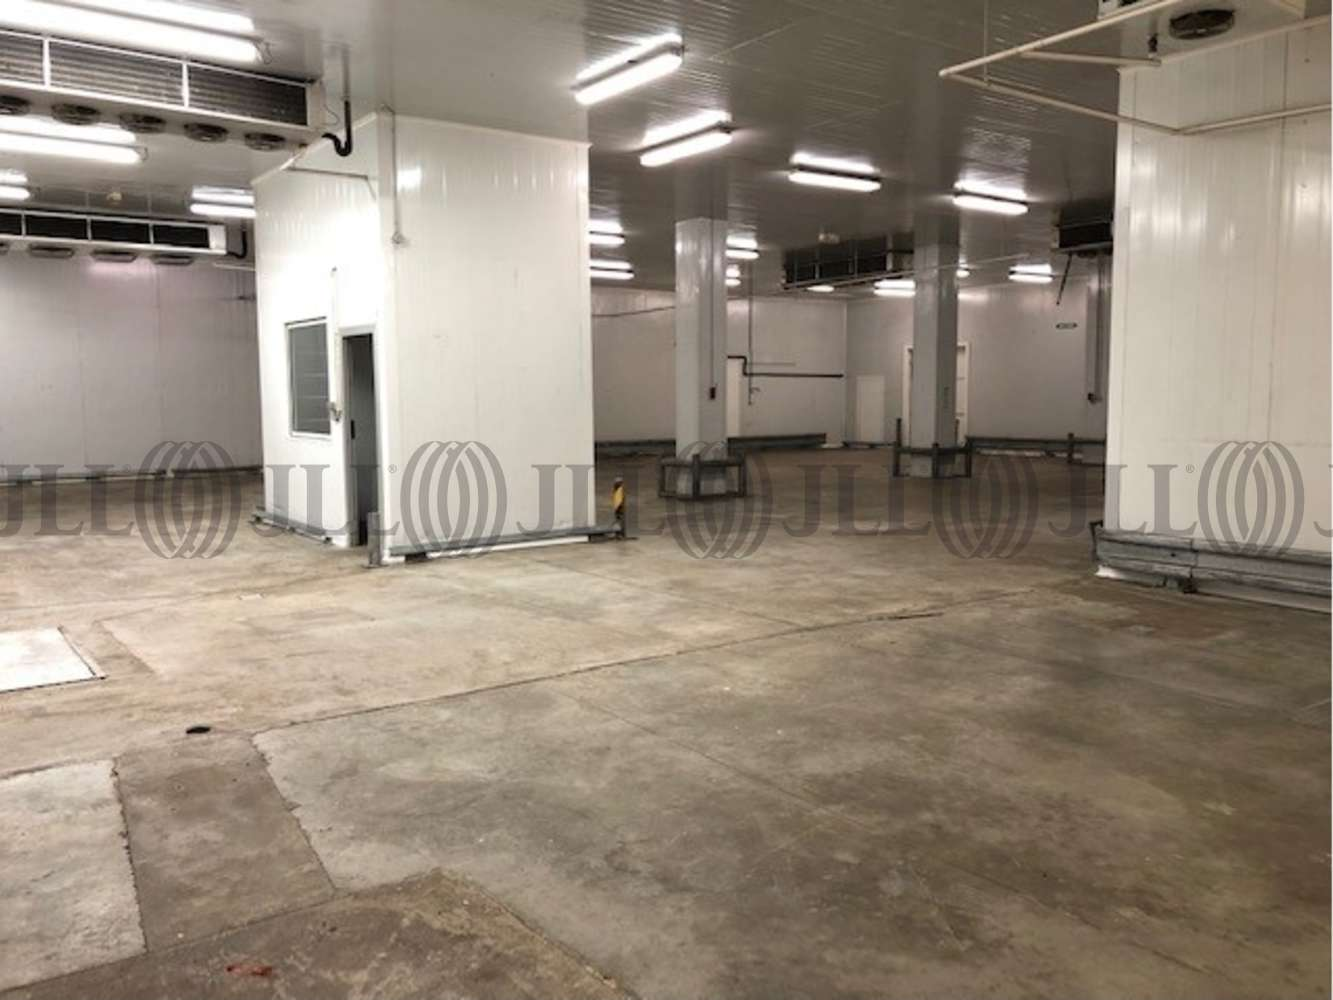 Activités/entrepôt St symphorien d ozon, 69360 - 11 RUE JULES FERRY